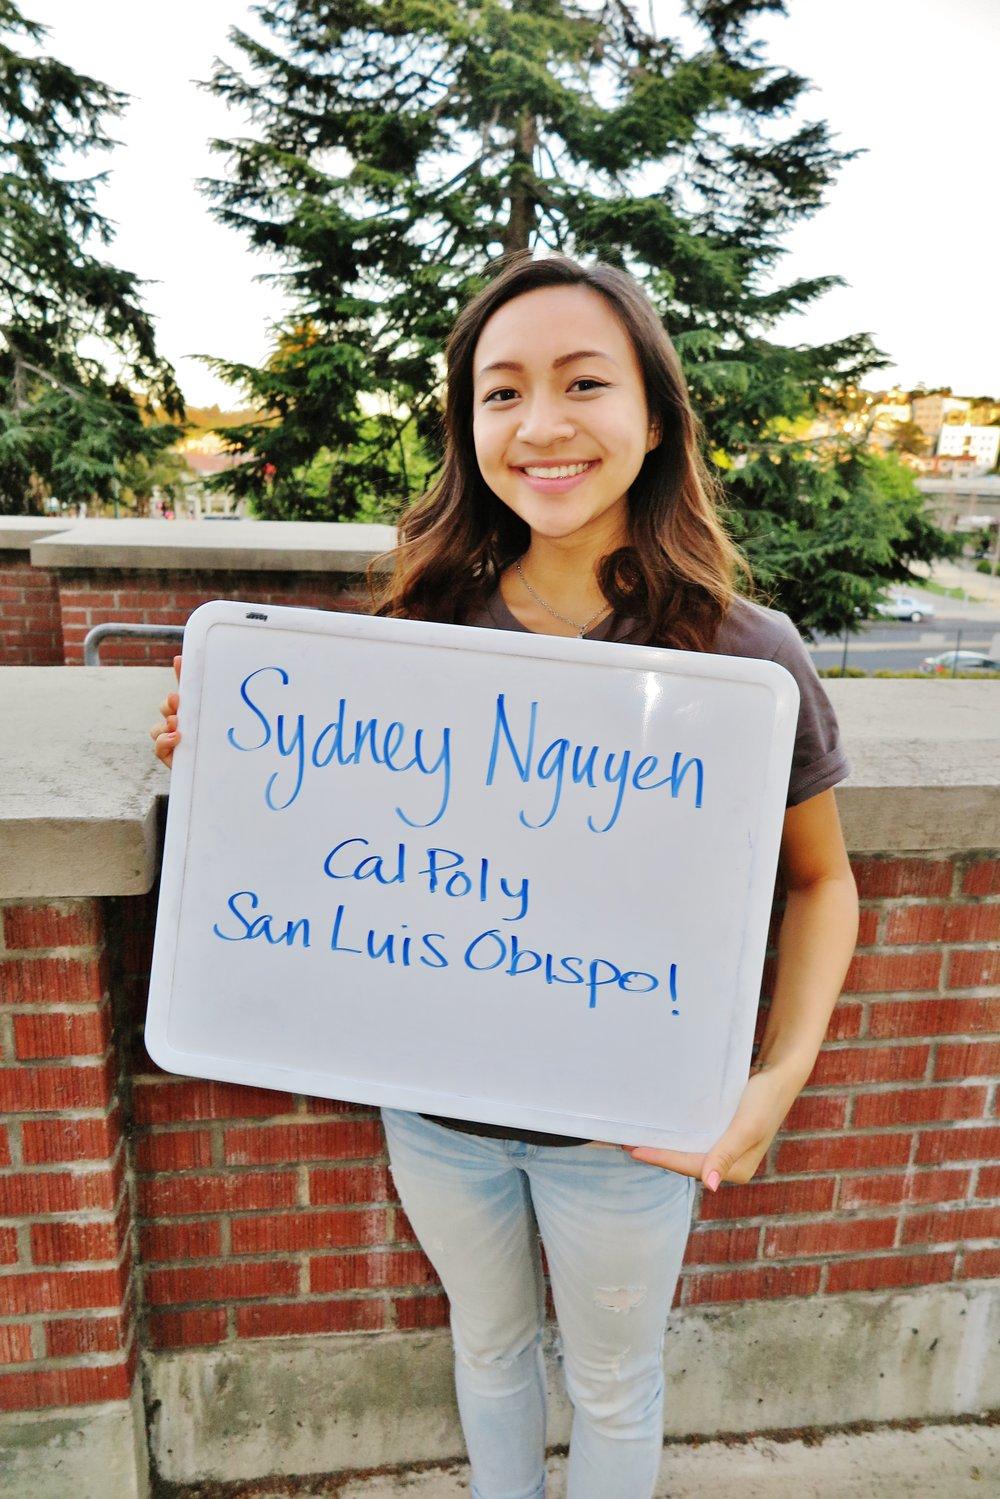 Sydney Nguyen.JPG